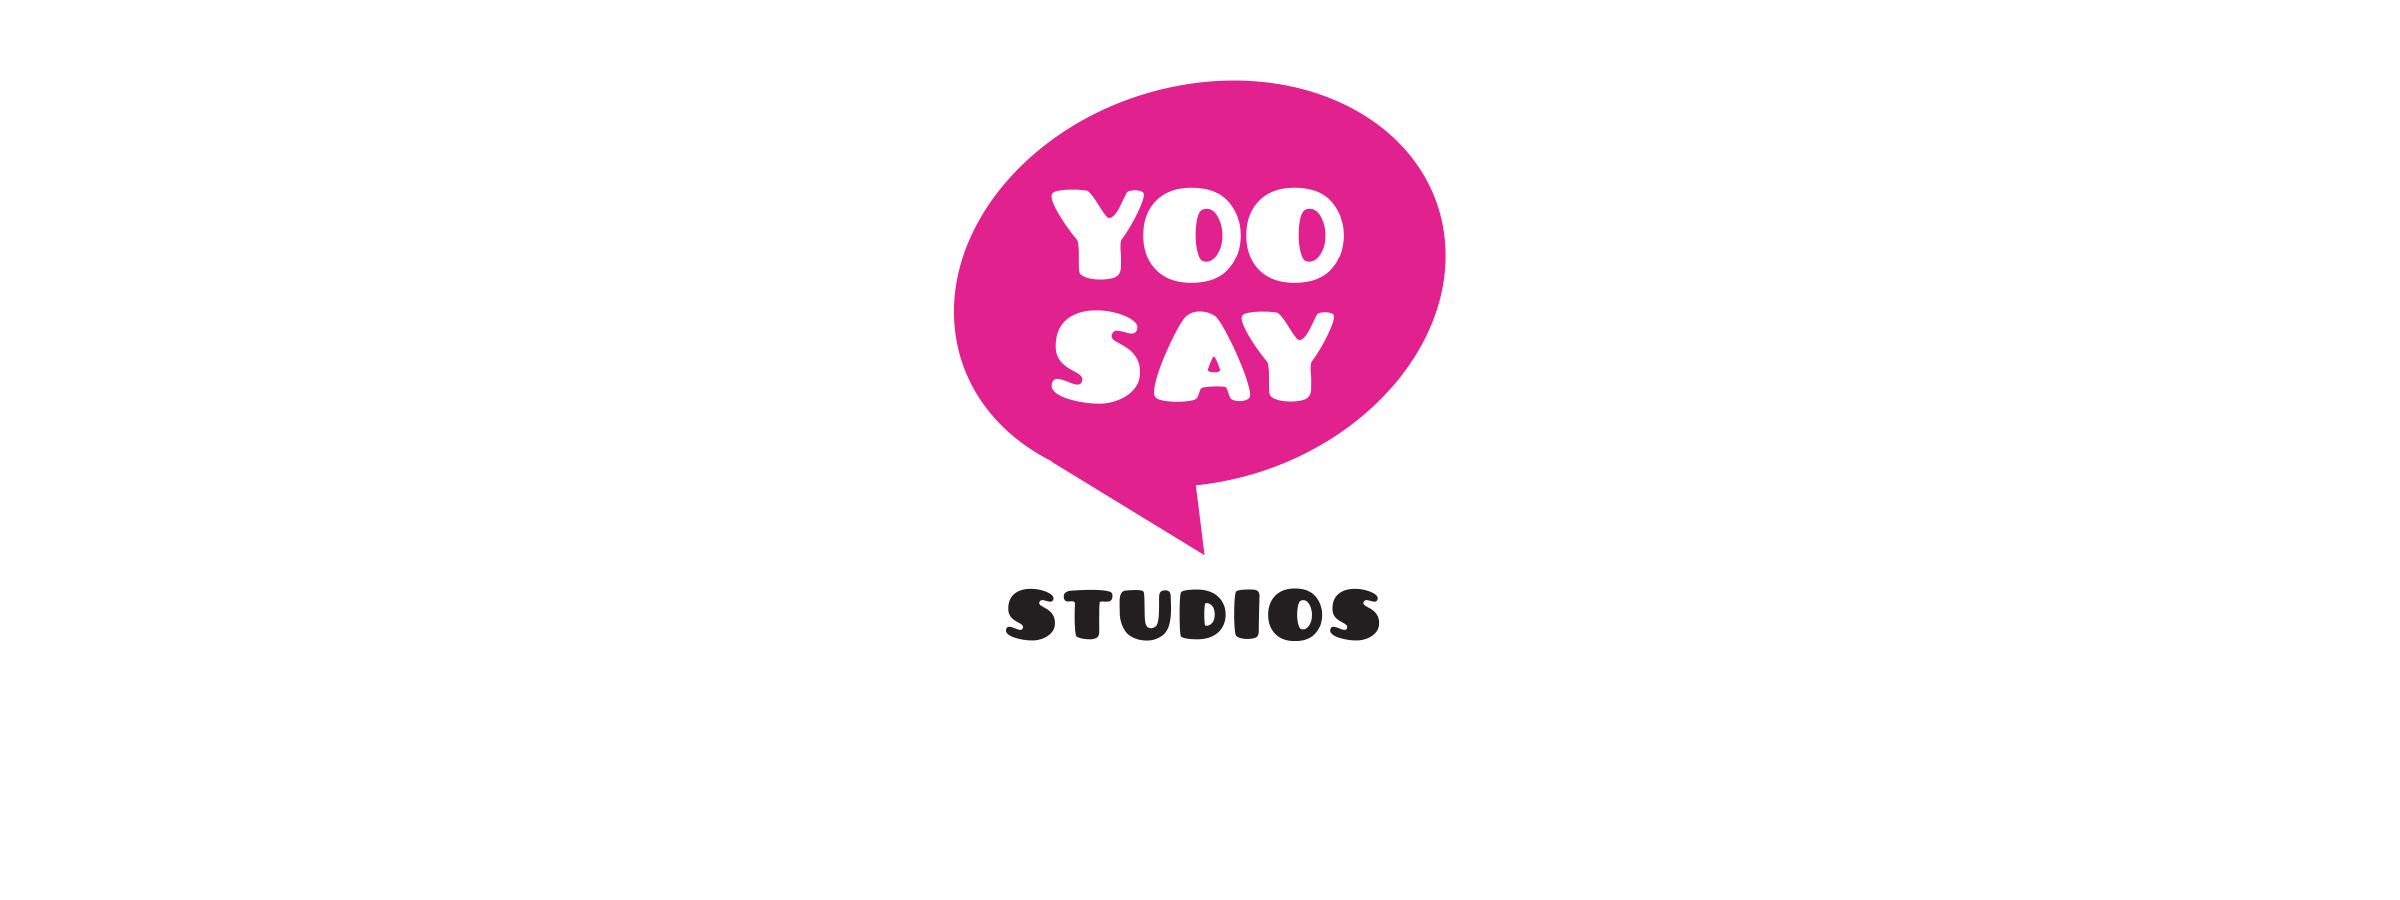 YooSay logo.jpg